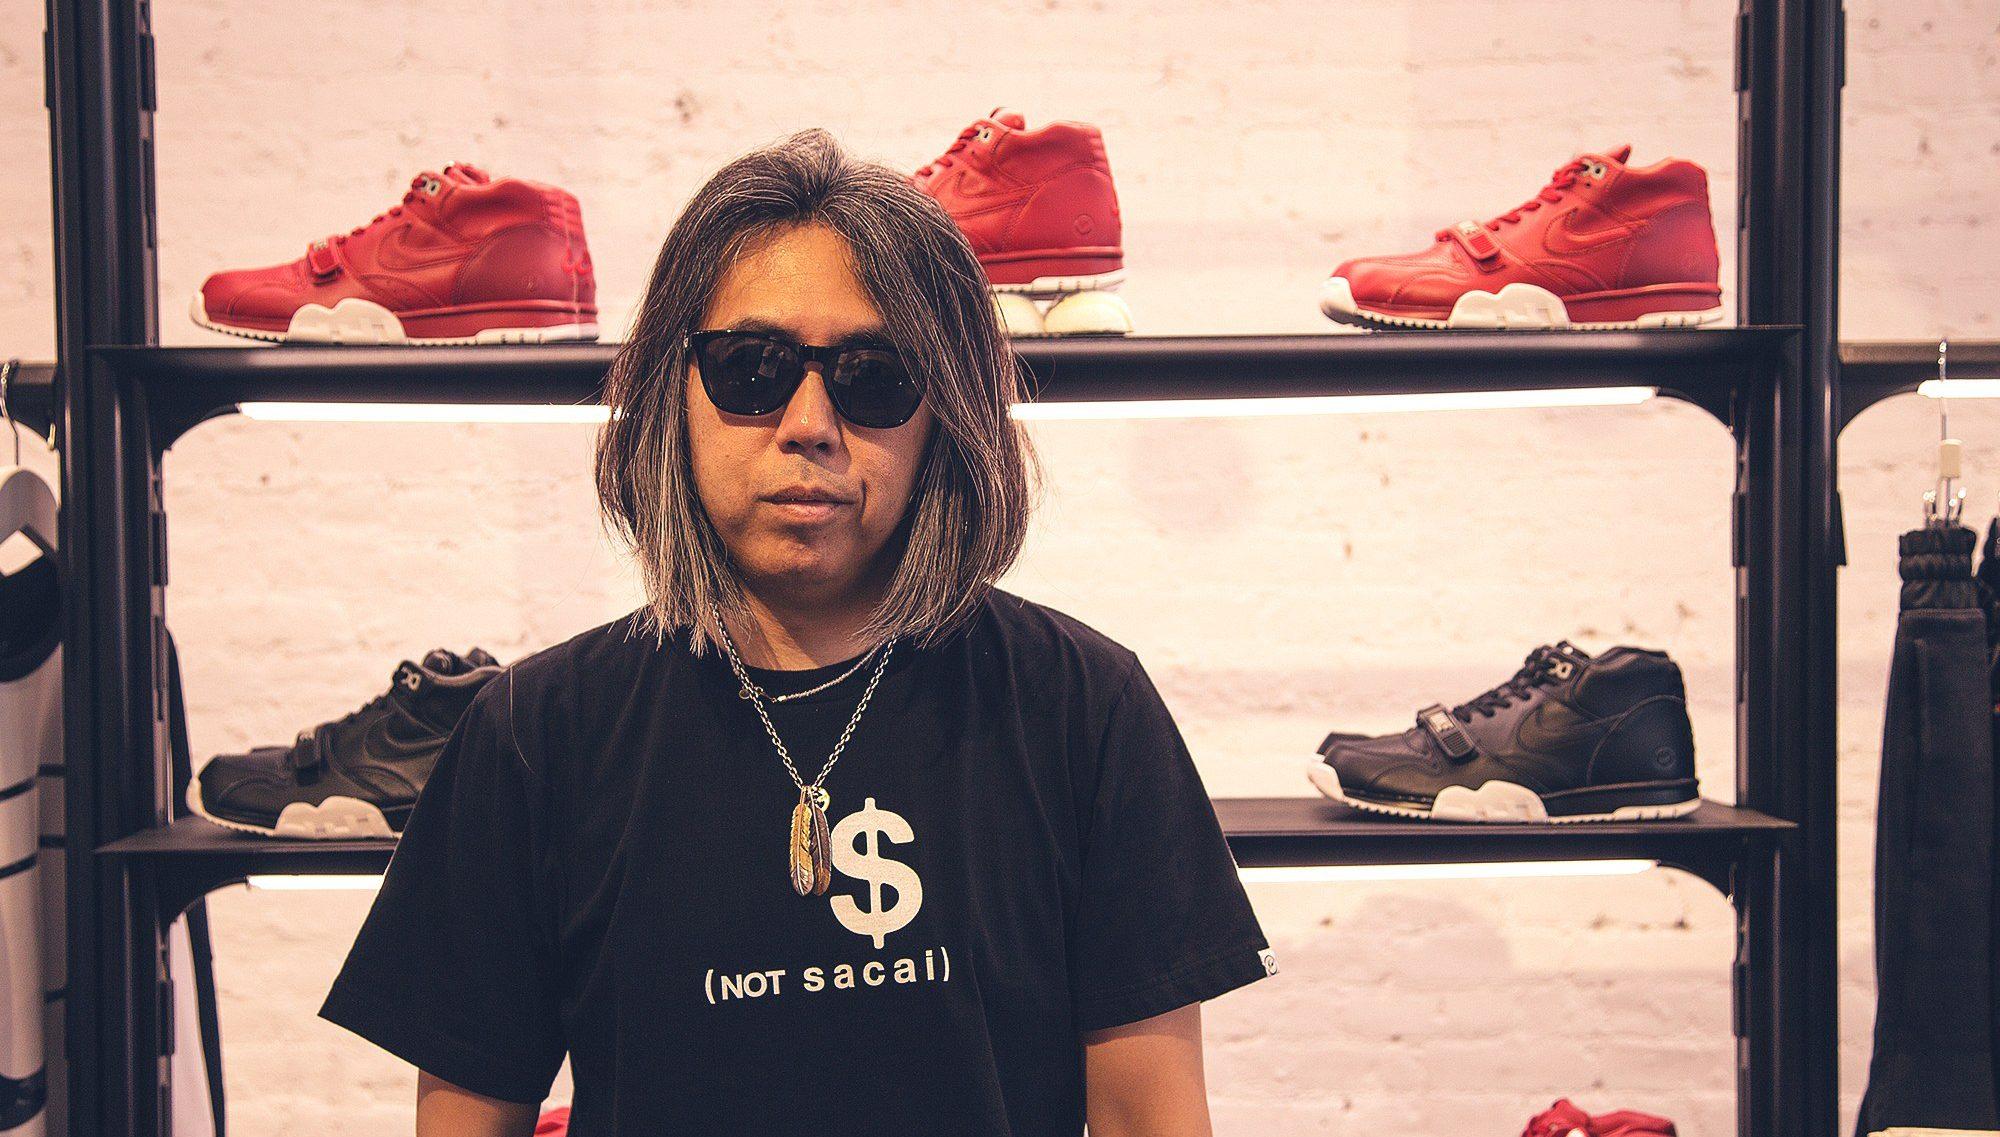 Je Hiroshi Fujiwara otec streetwearu?